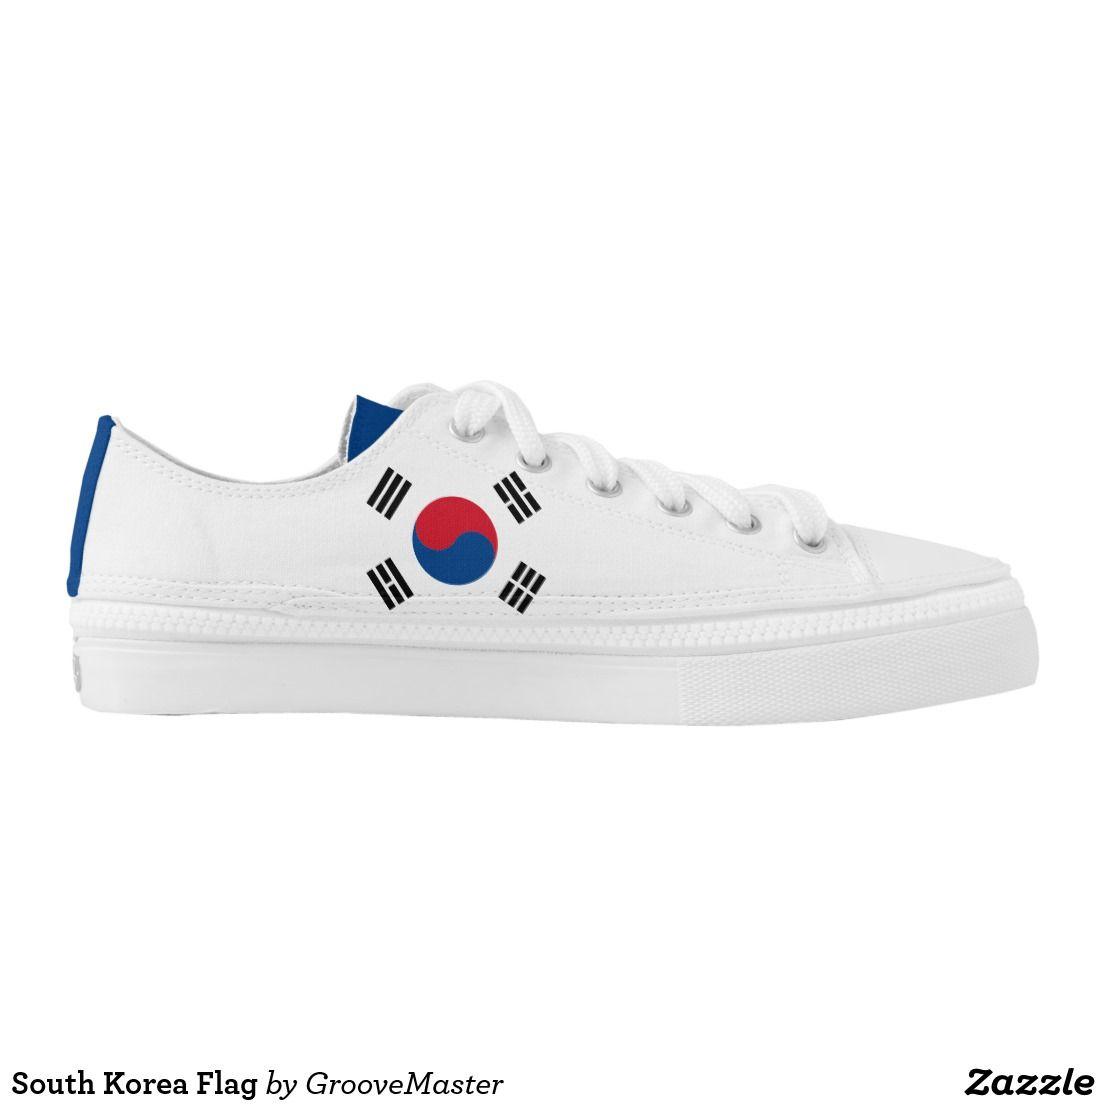 South Korea Flag Low-Top Sneakers